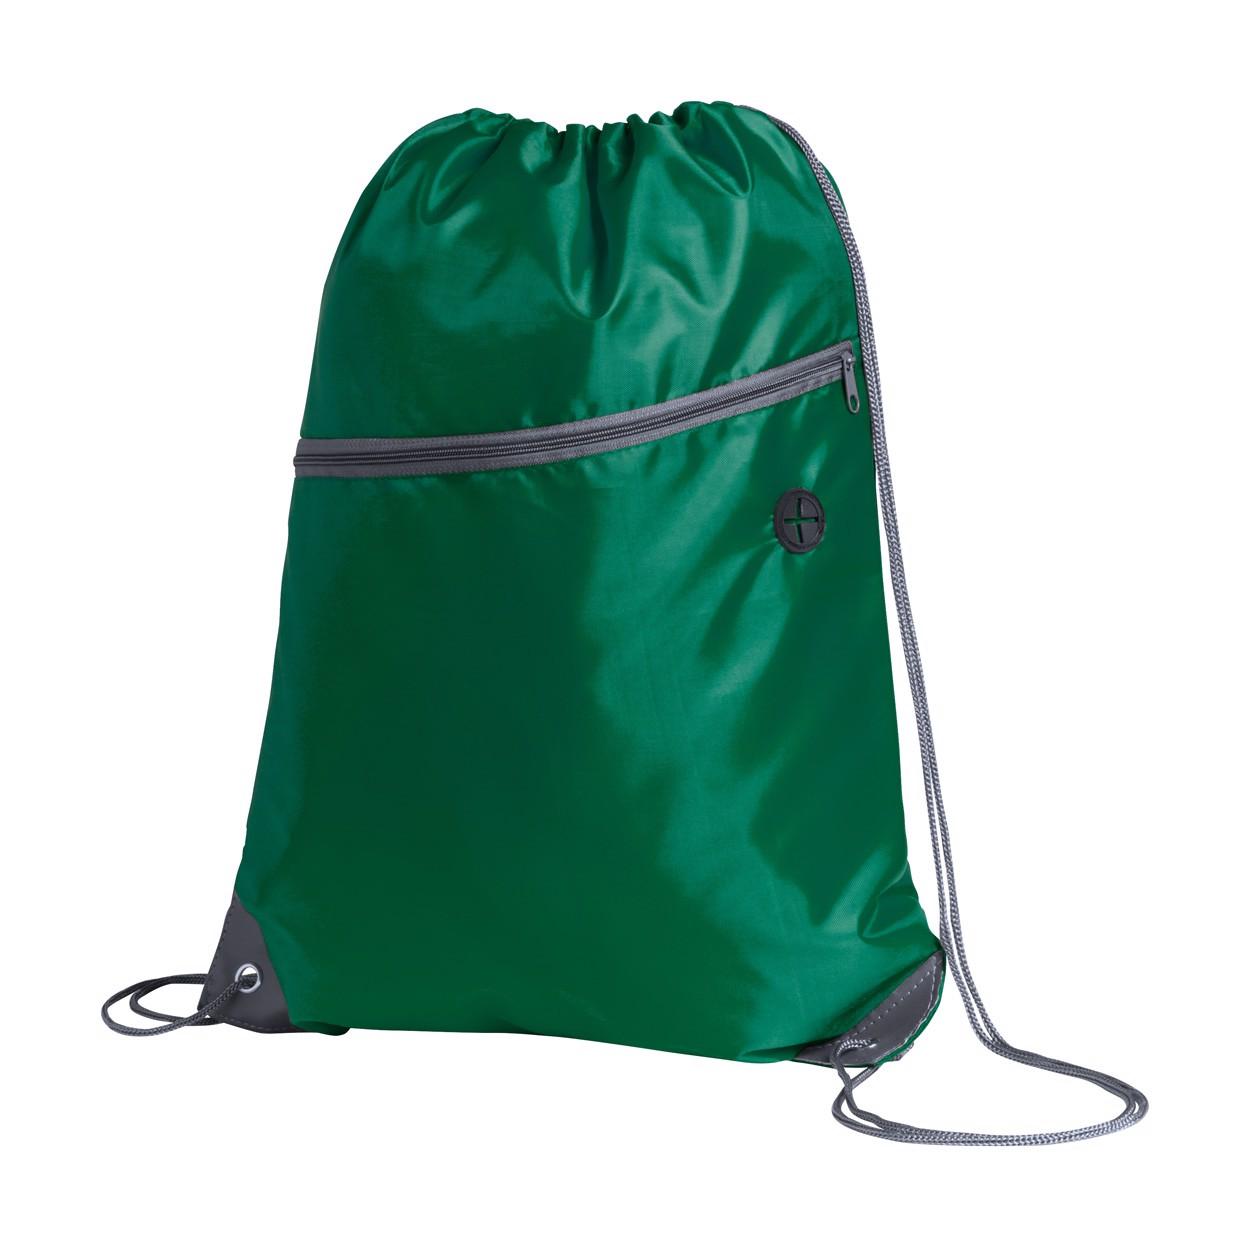 Drawstring Bag Blades - Green